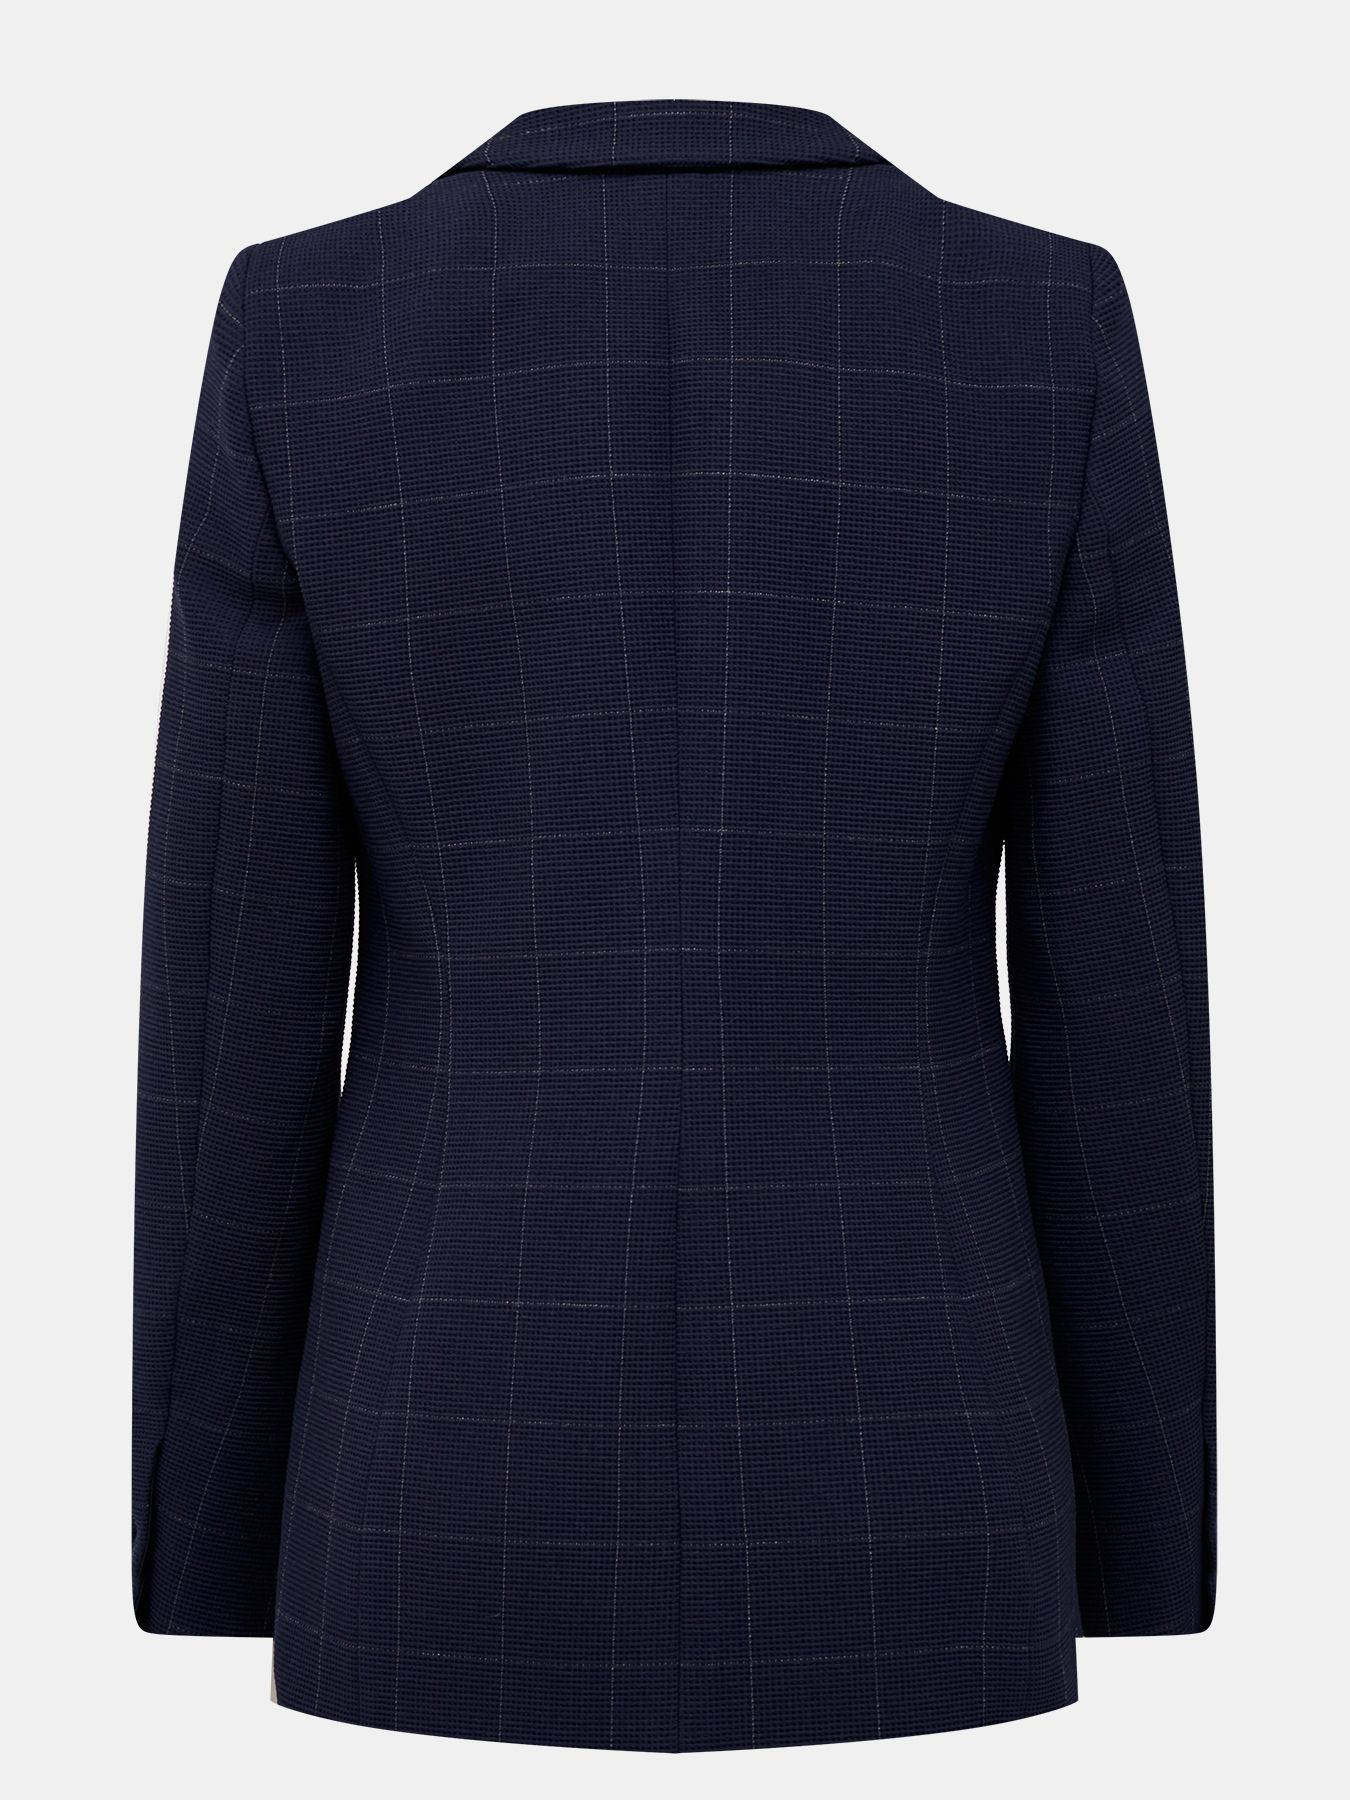 Жакет Emporio Armani Пиджак пиджак emporio armani пиджак